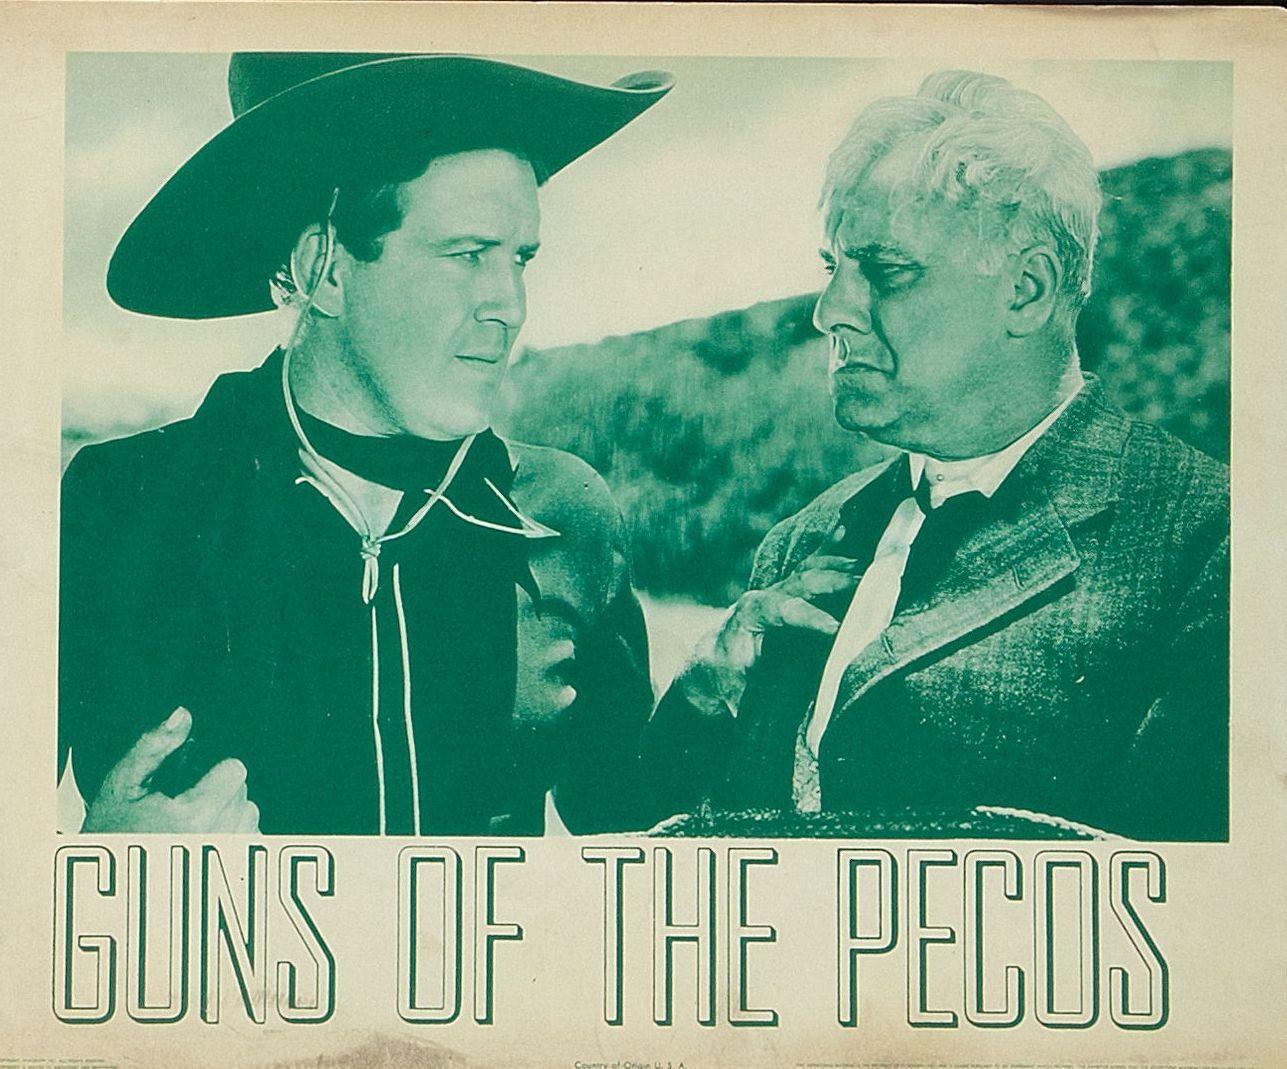 Dick Foran and Robert Middlemass in Guns of the Pecos (1937)